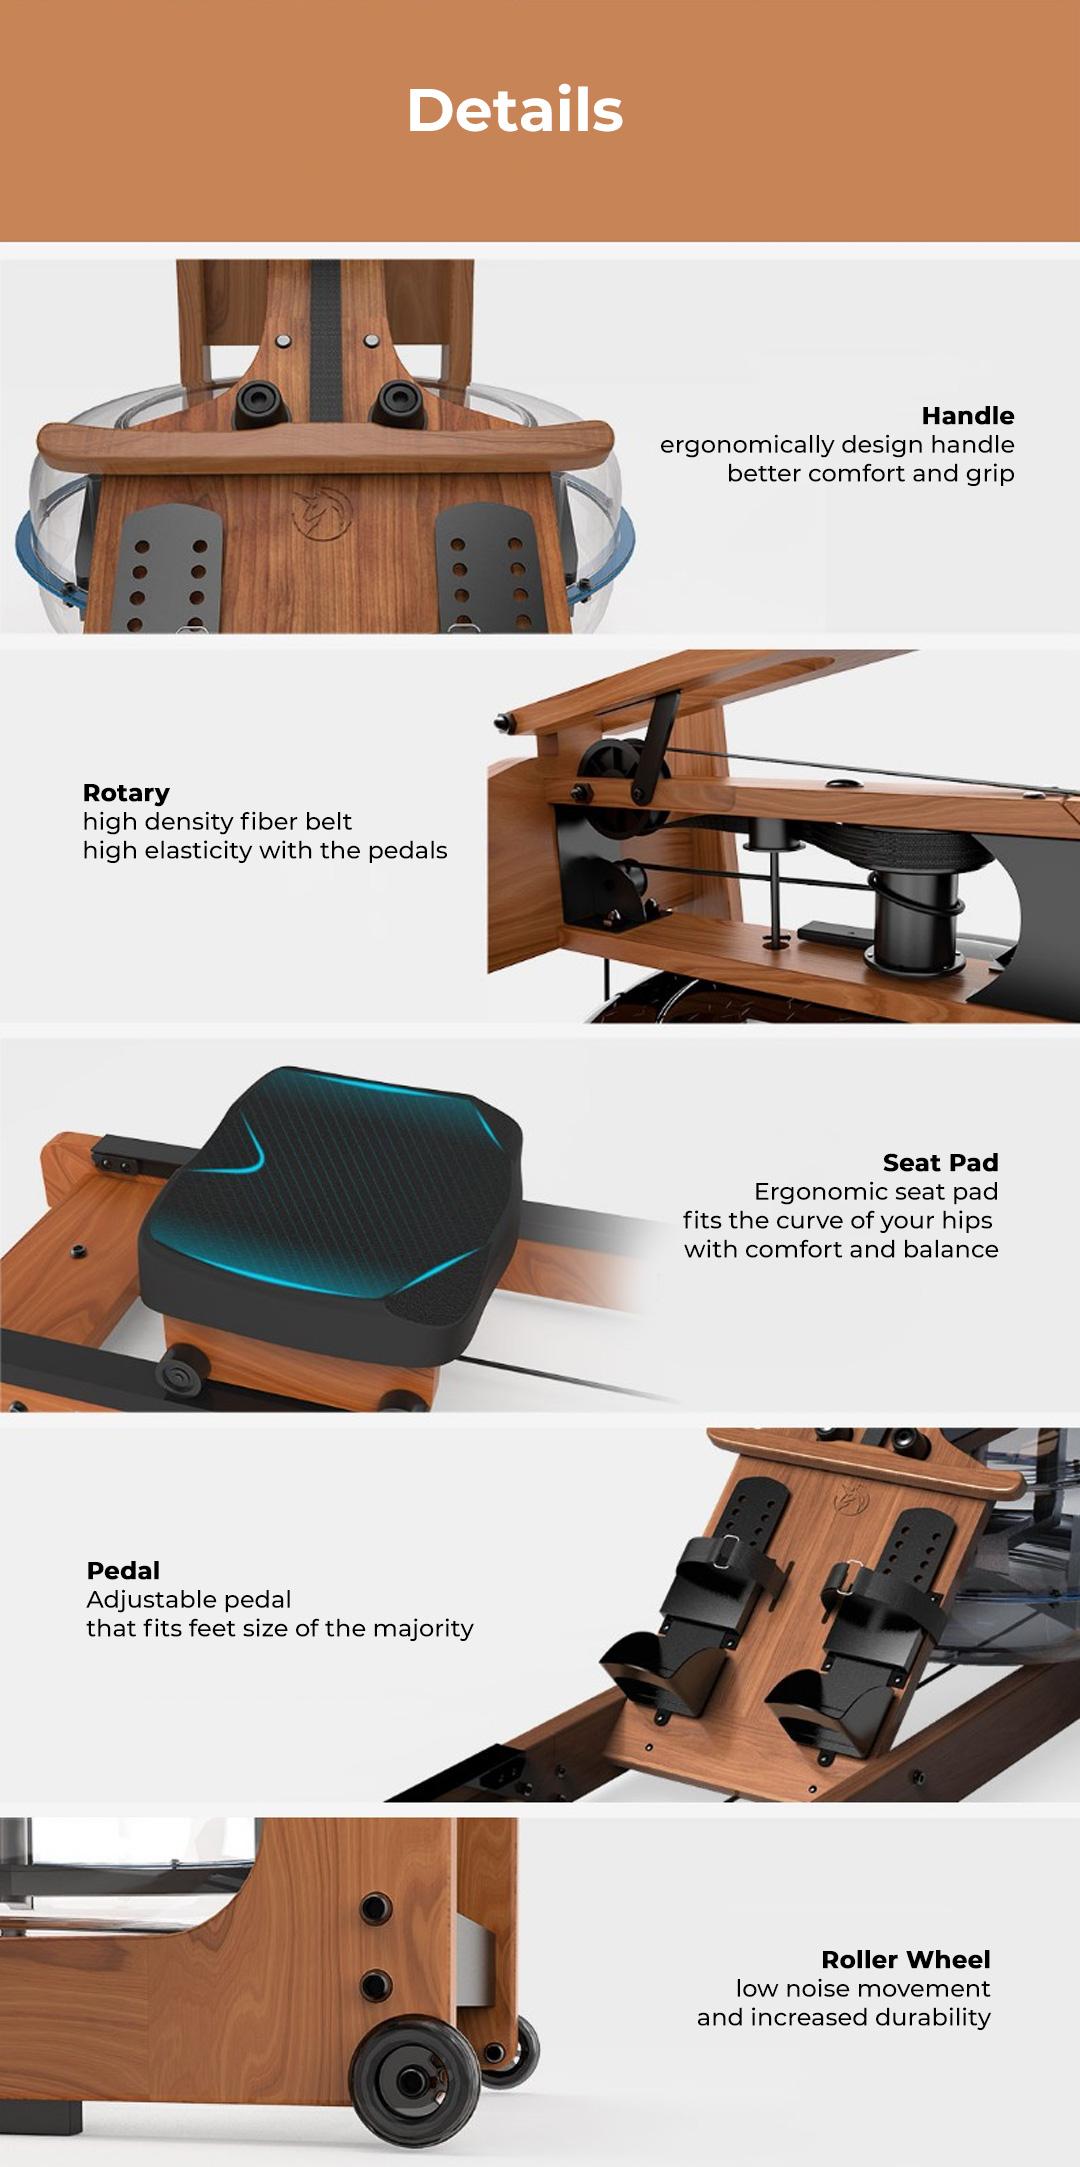 Yesoul Smart Foldable Rowing Machine R30